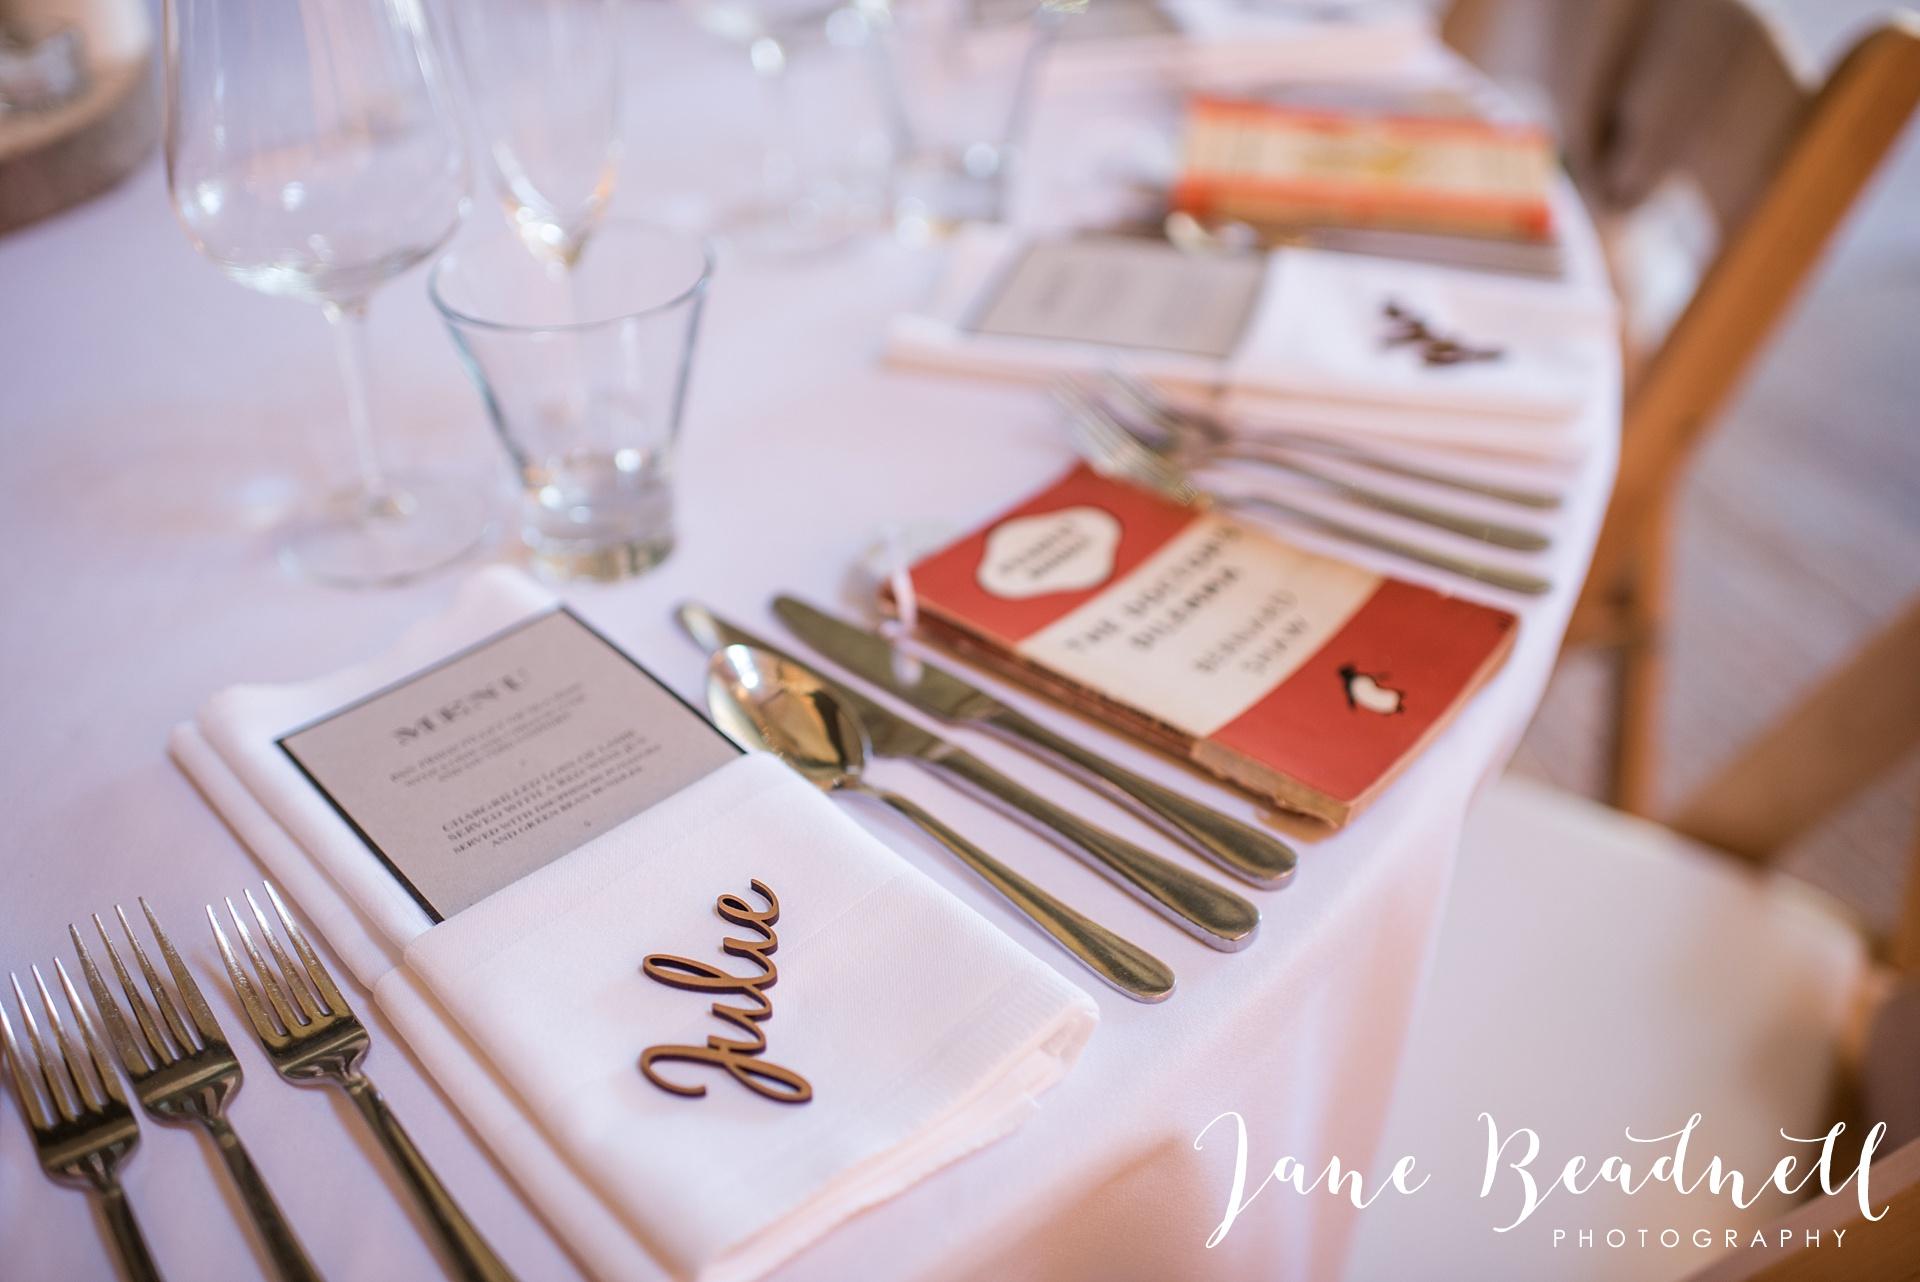 fine-art-wedding-photographer-jane-beadnell-yorkshire-wedding-photographer_0099